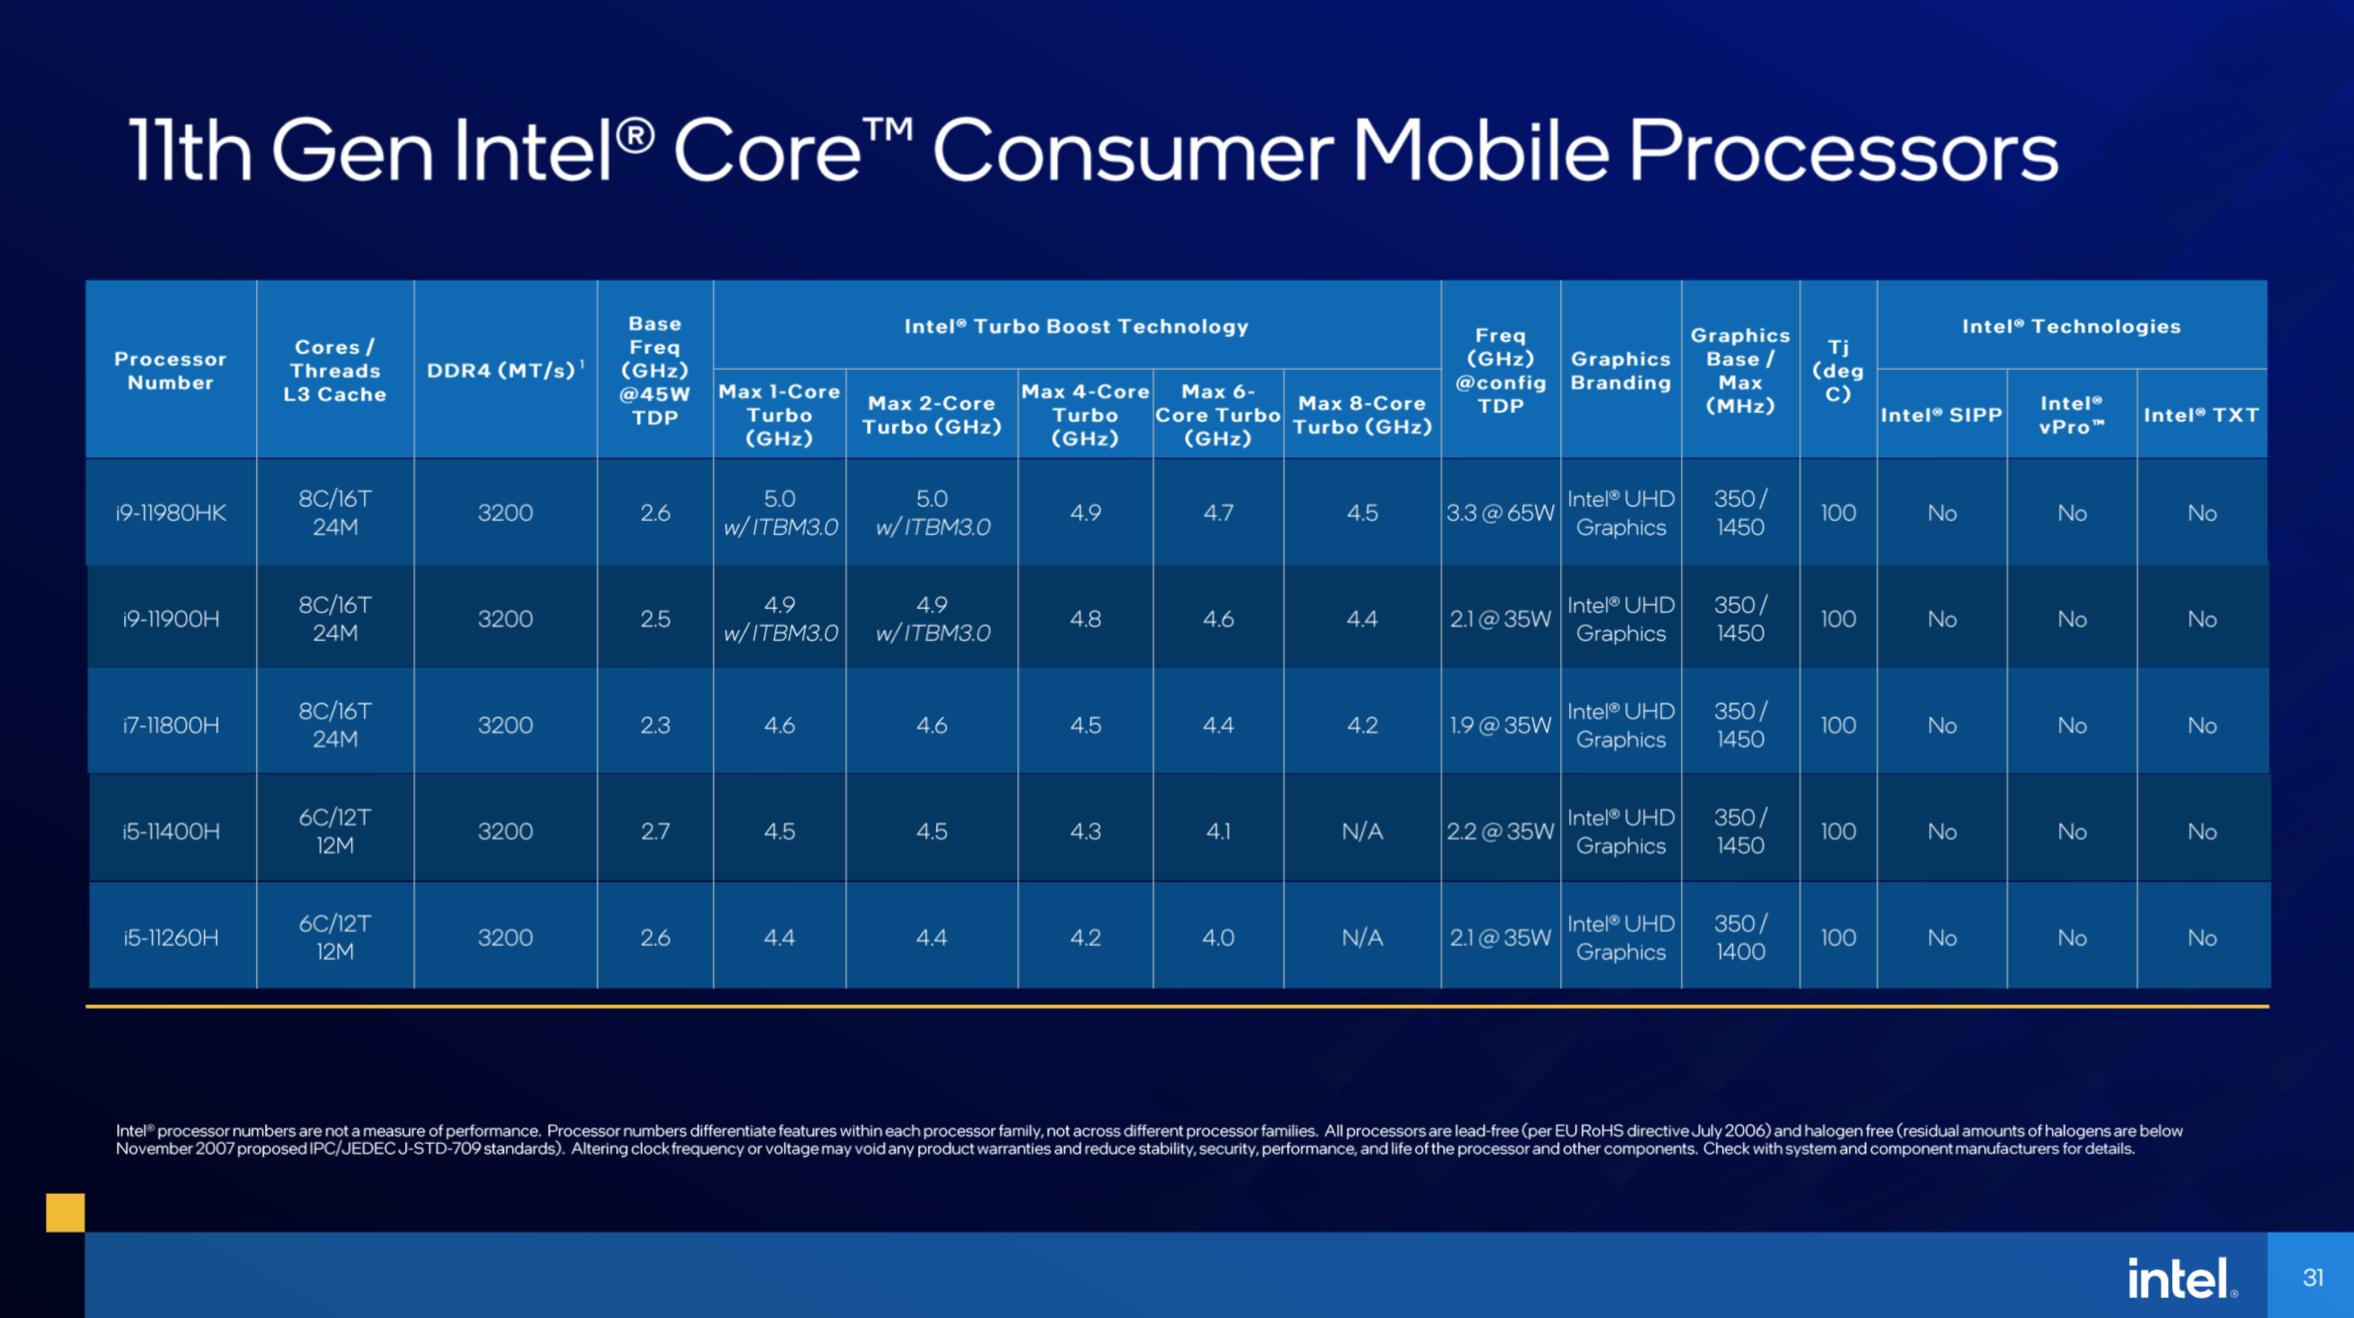 Intel Launches 11th Gen Tiger Lake-H Mobile Processors - Processors 8